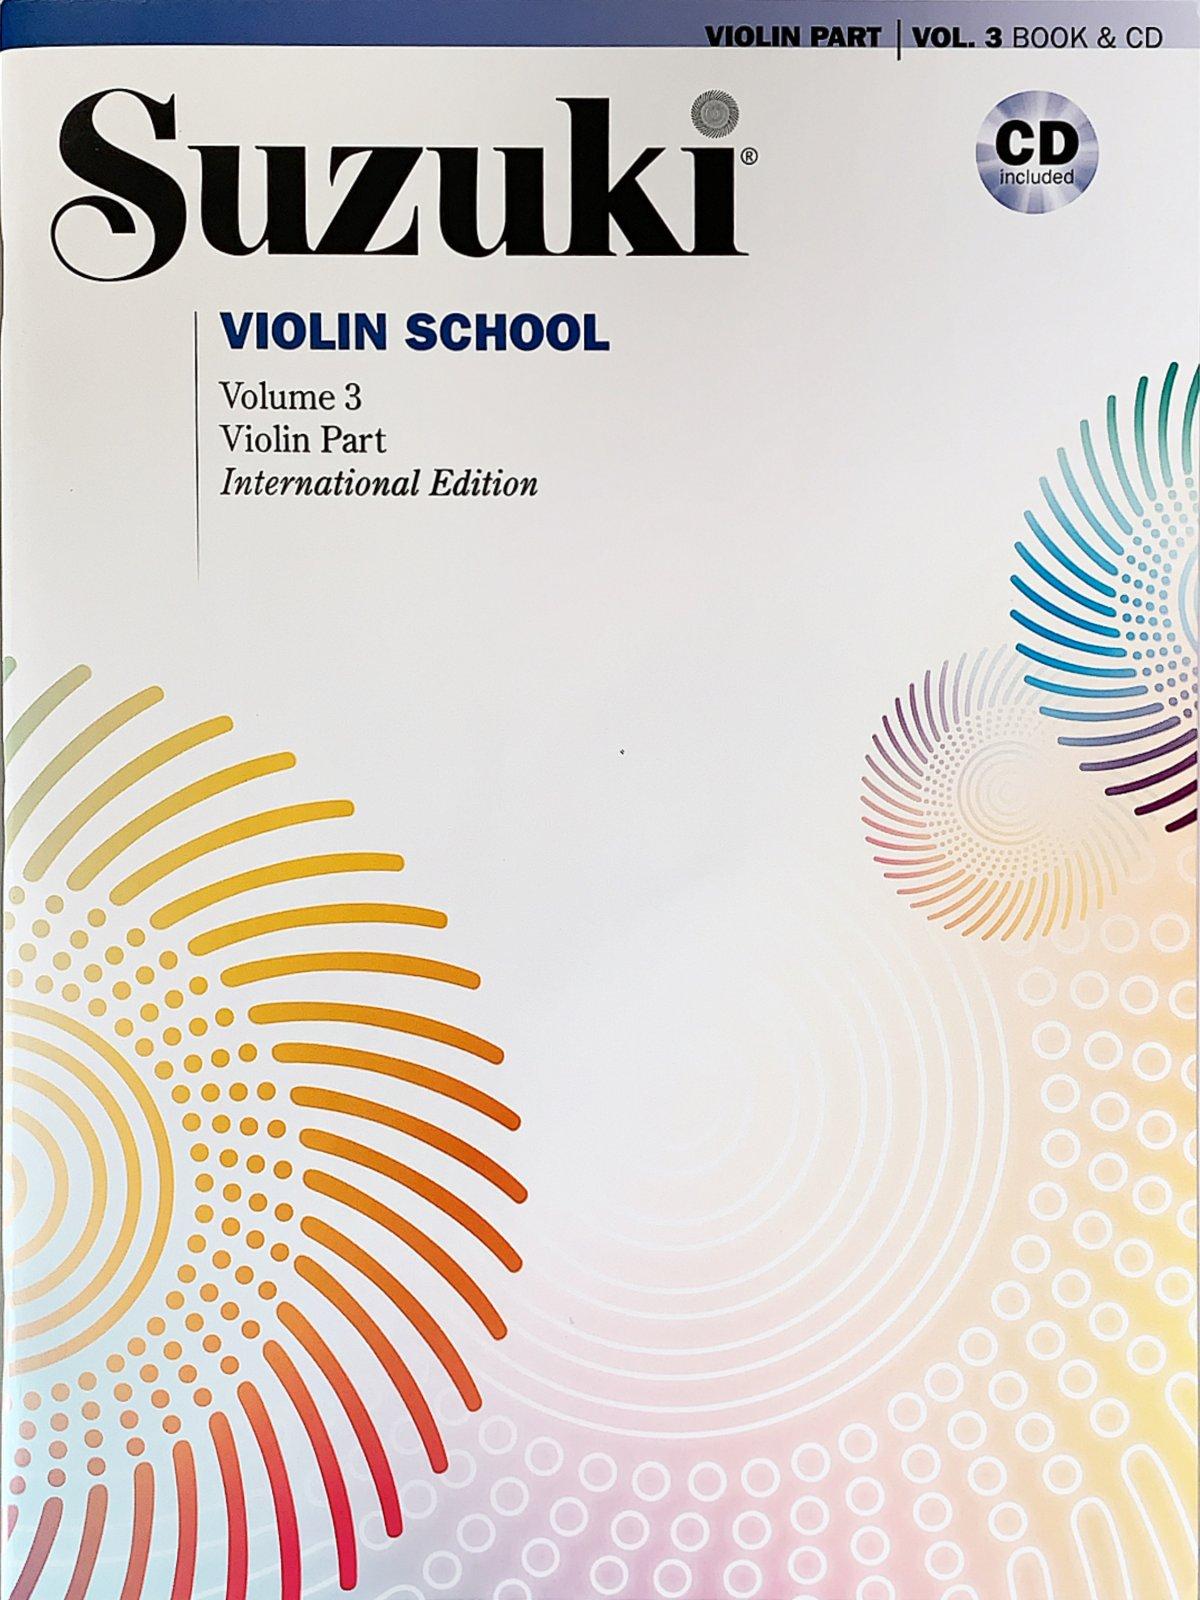 Suzuki Violin School Vol 3 and CD - Summy-Birchard